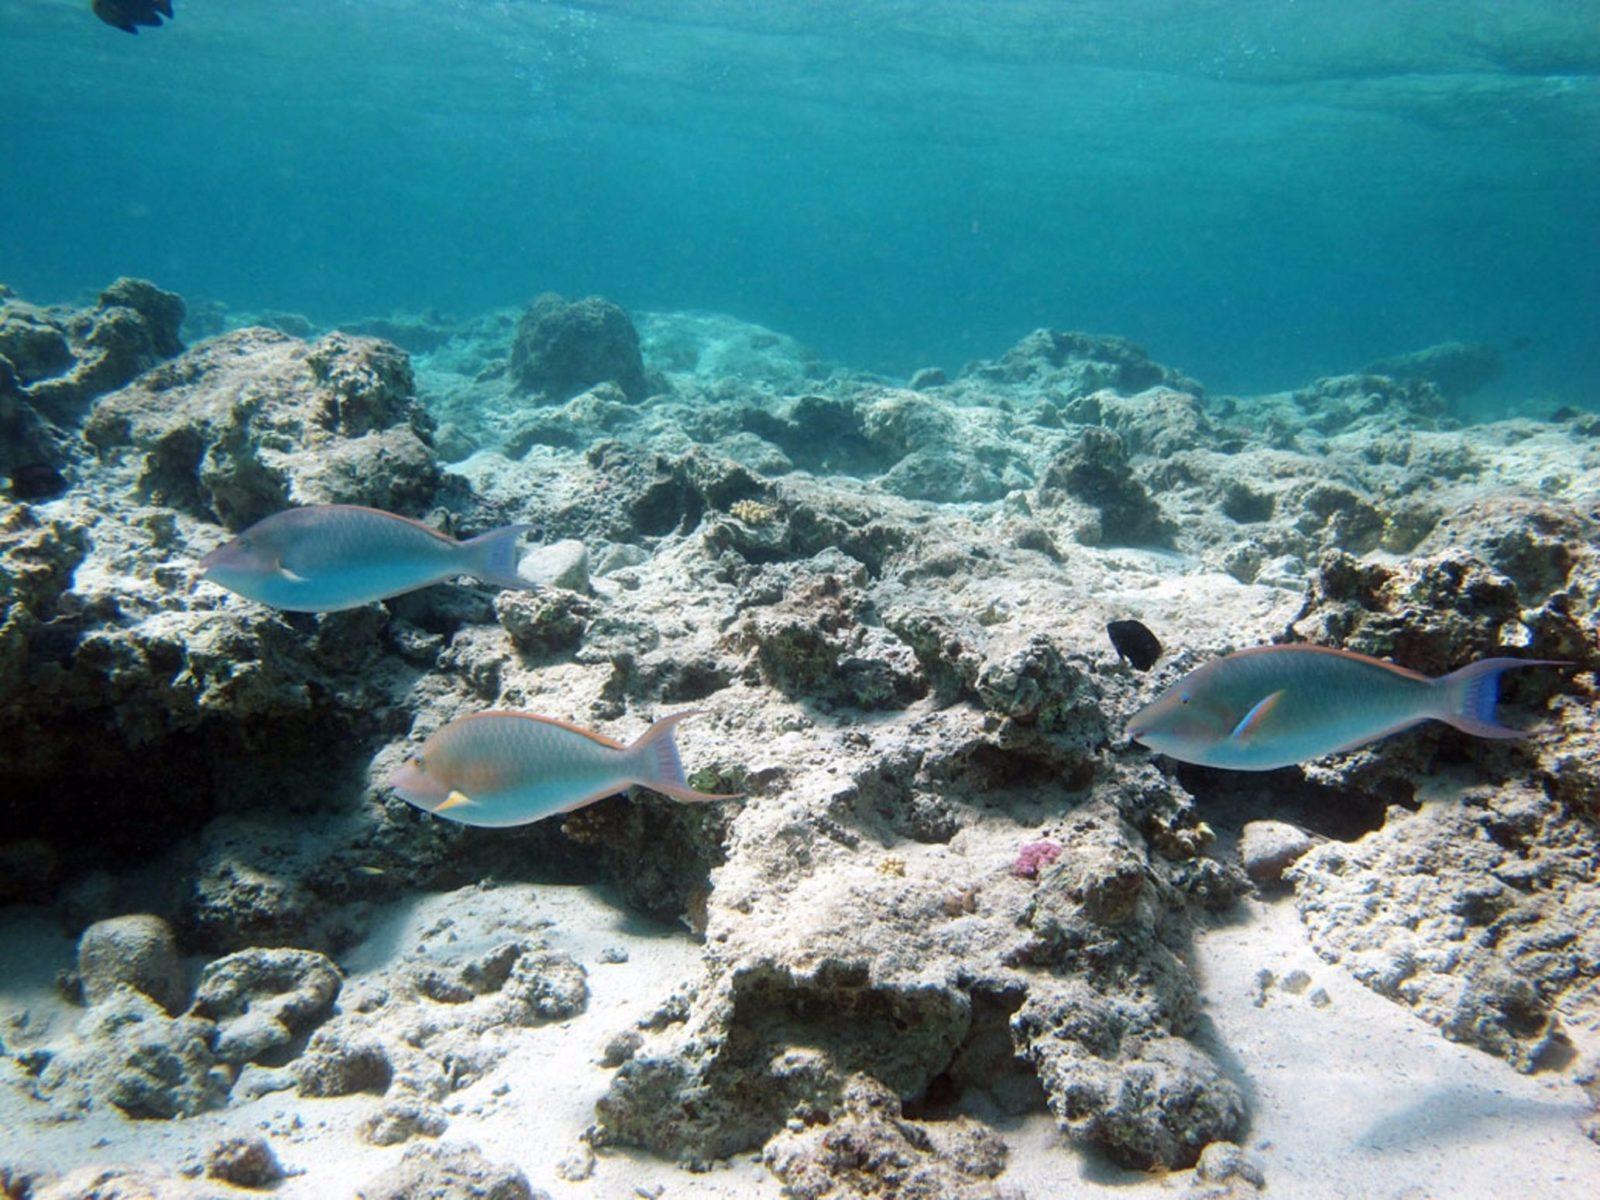 Purdy Point, Coral Bay, Western Australia